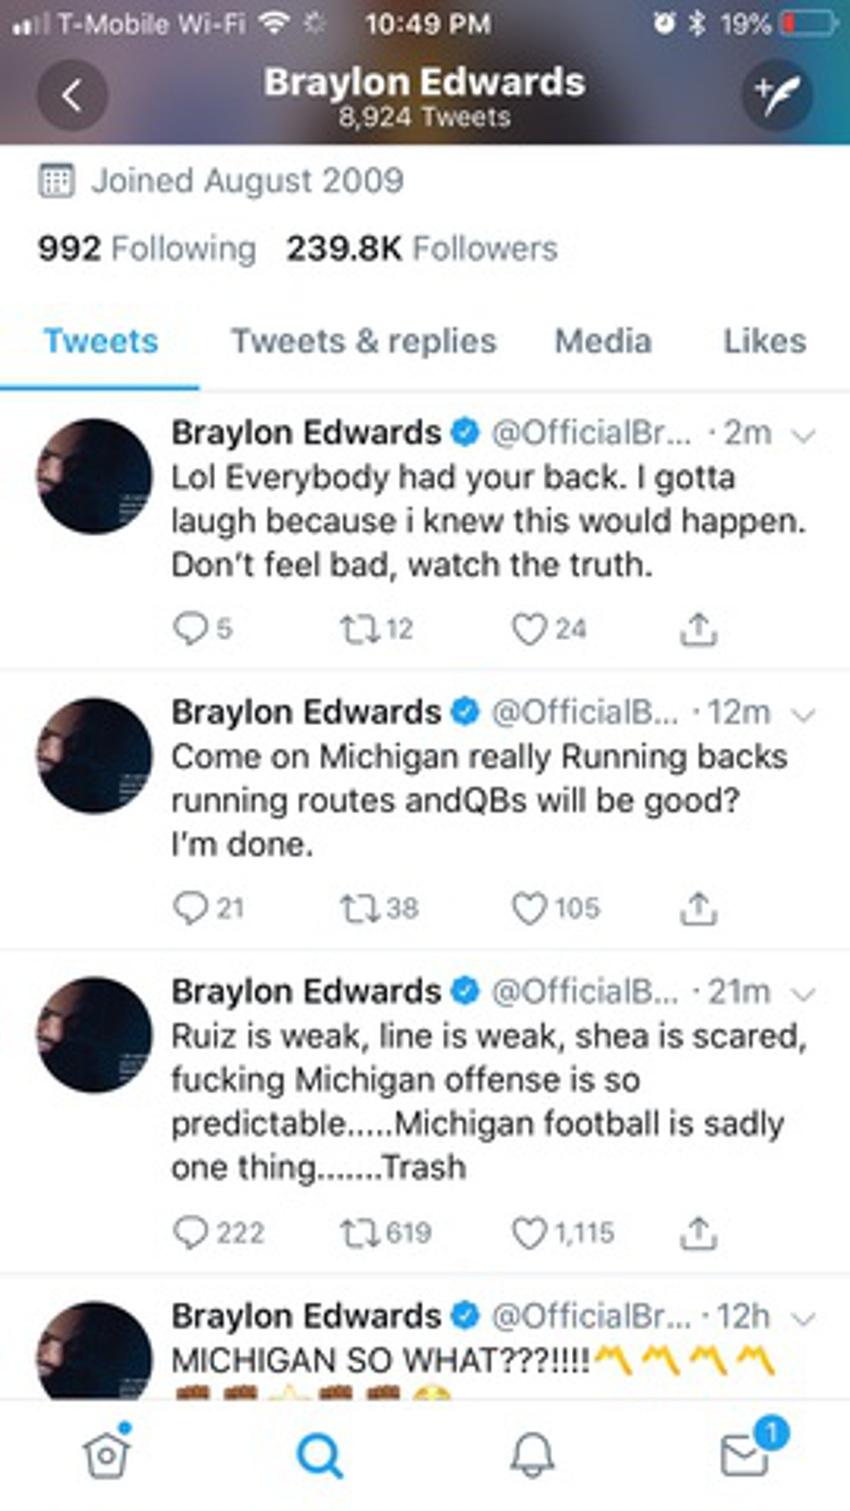 Braylon Edwards' since-deleted tweets.